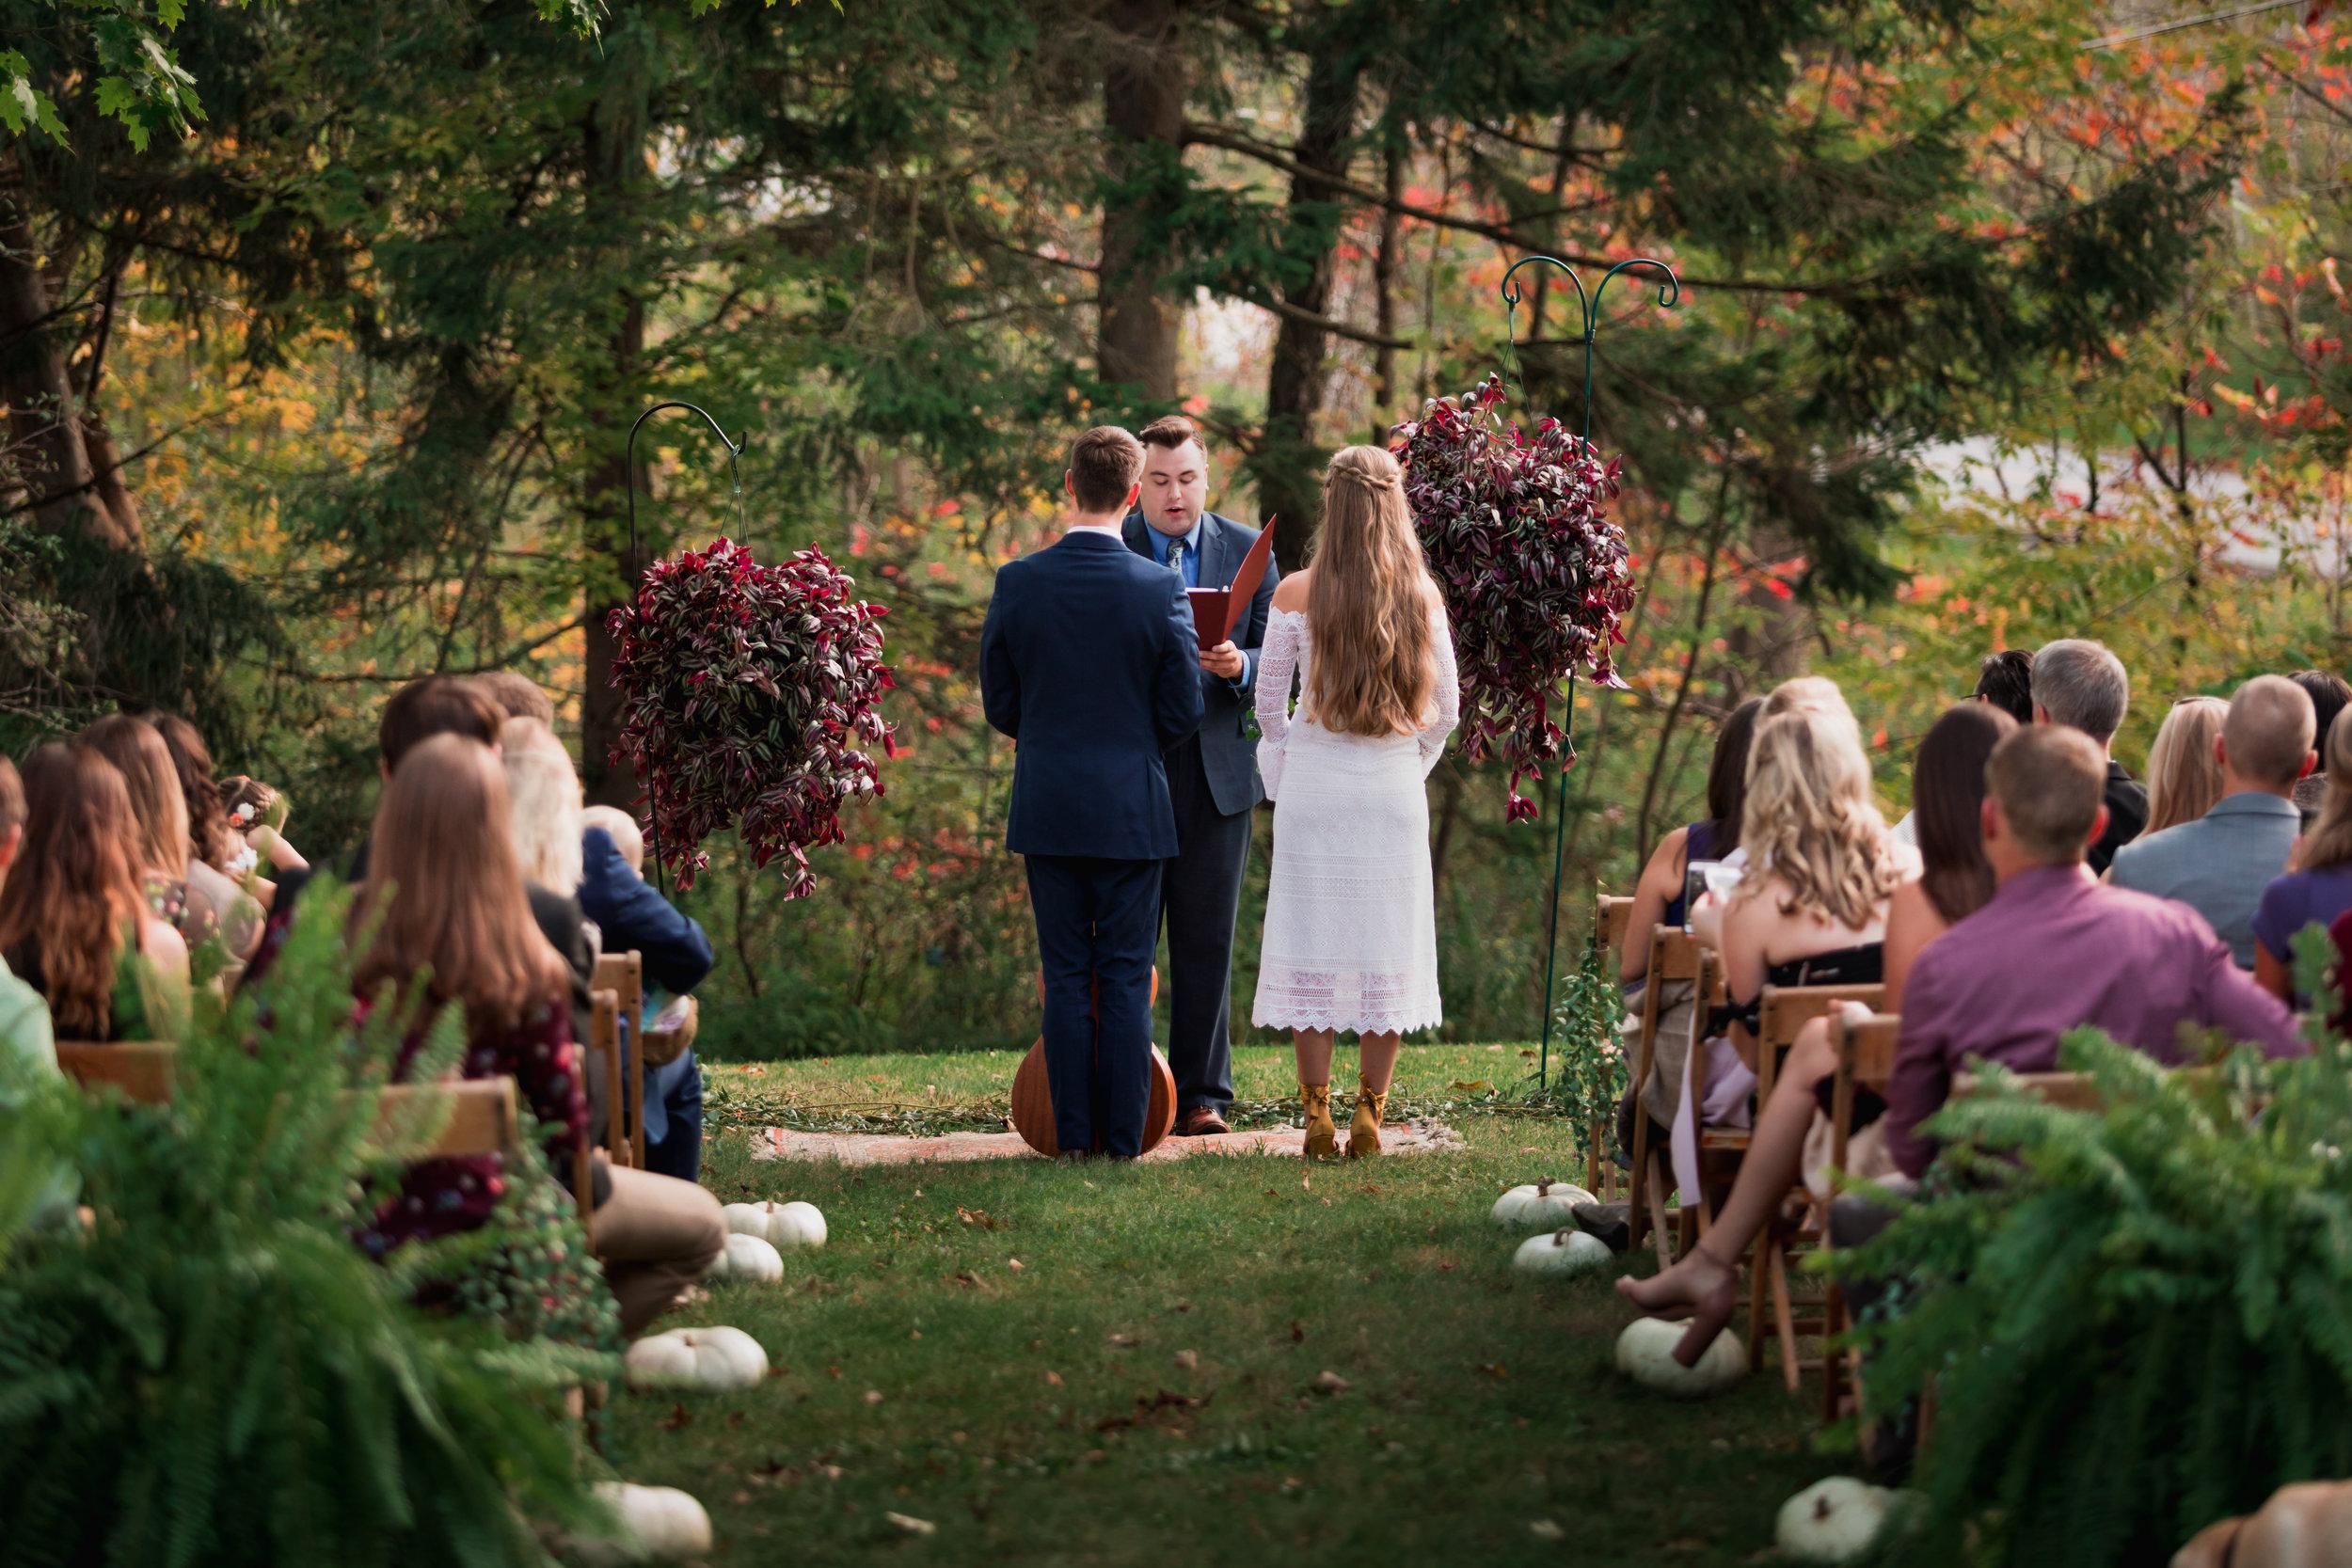 vild-photography-photographer-tahoe-intimate-wedding-adventure-van-abigail-23.jpg